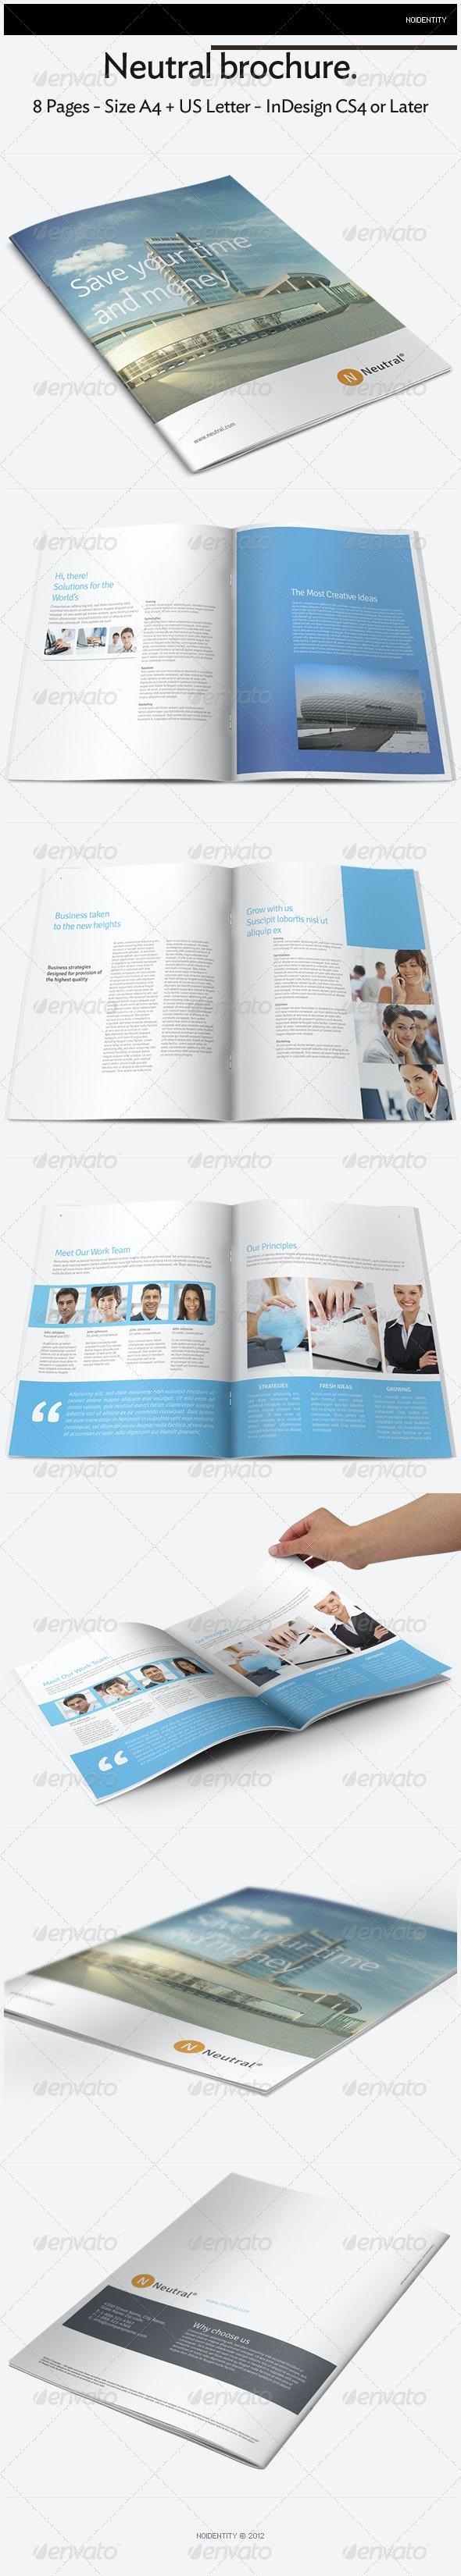 Neutral Brochure - Brochures Print Templates